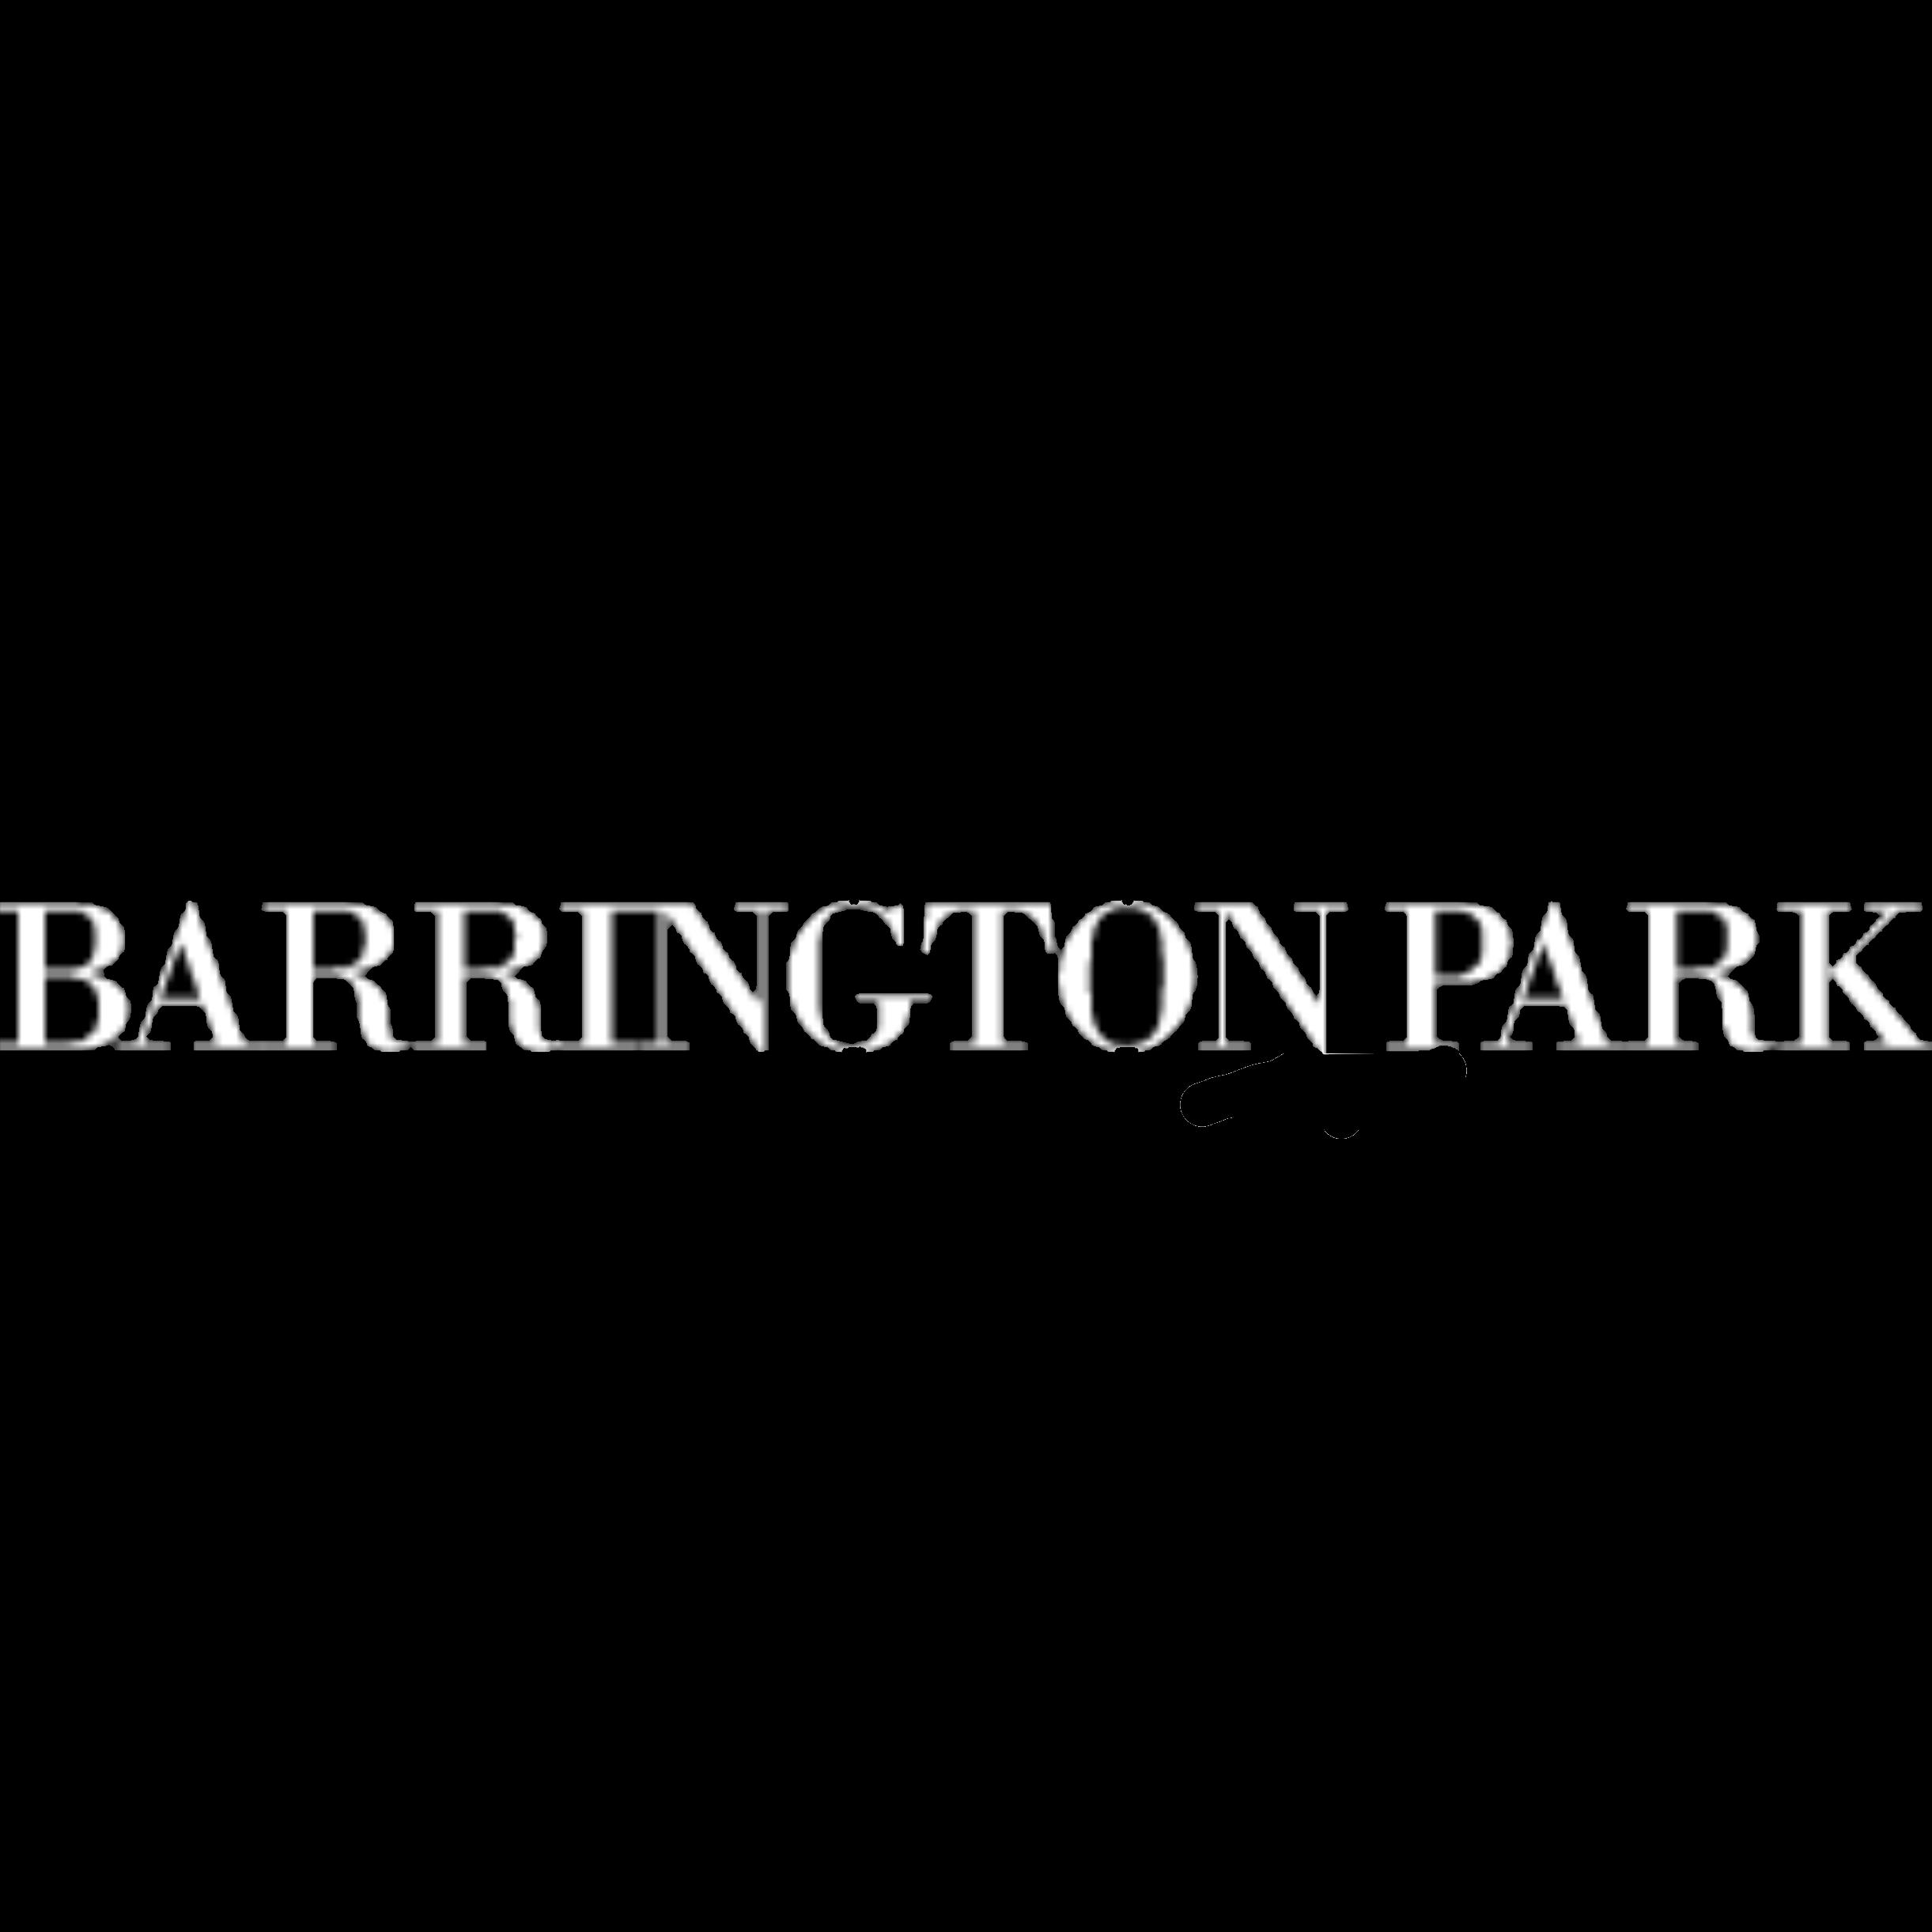 Barrington Park image 7